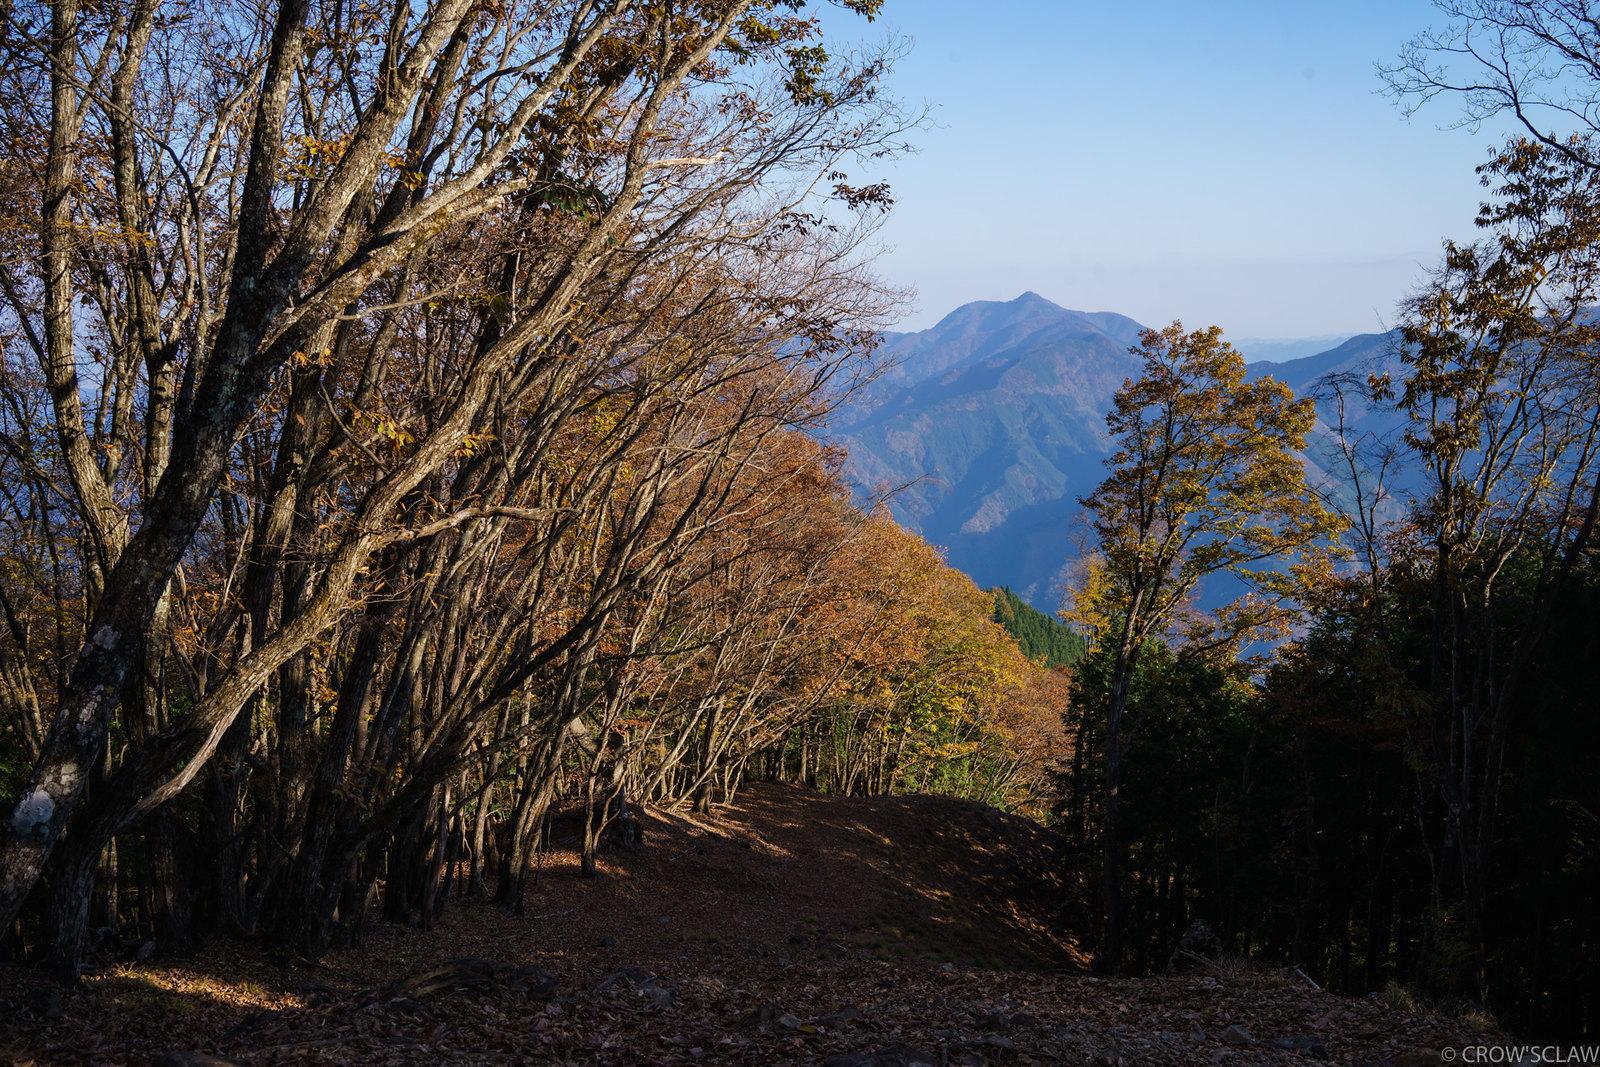 2017.11.05 鷹ノ巣山